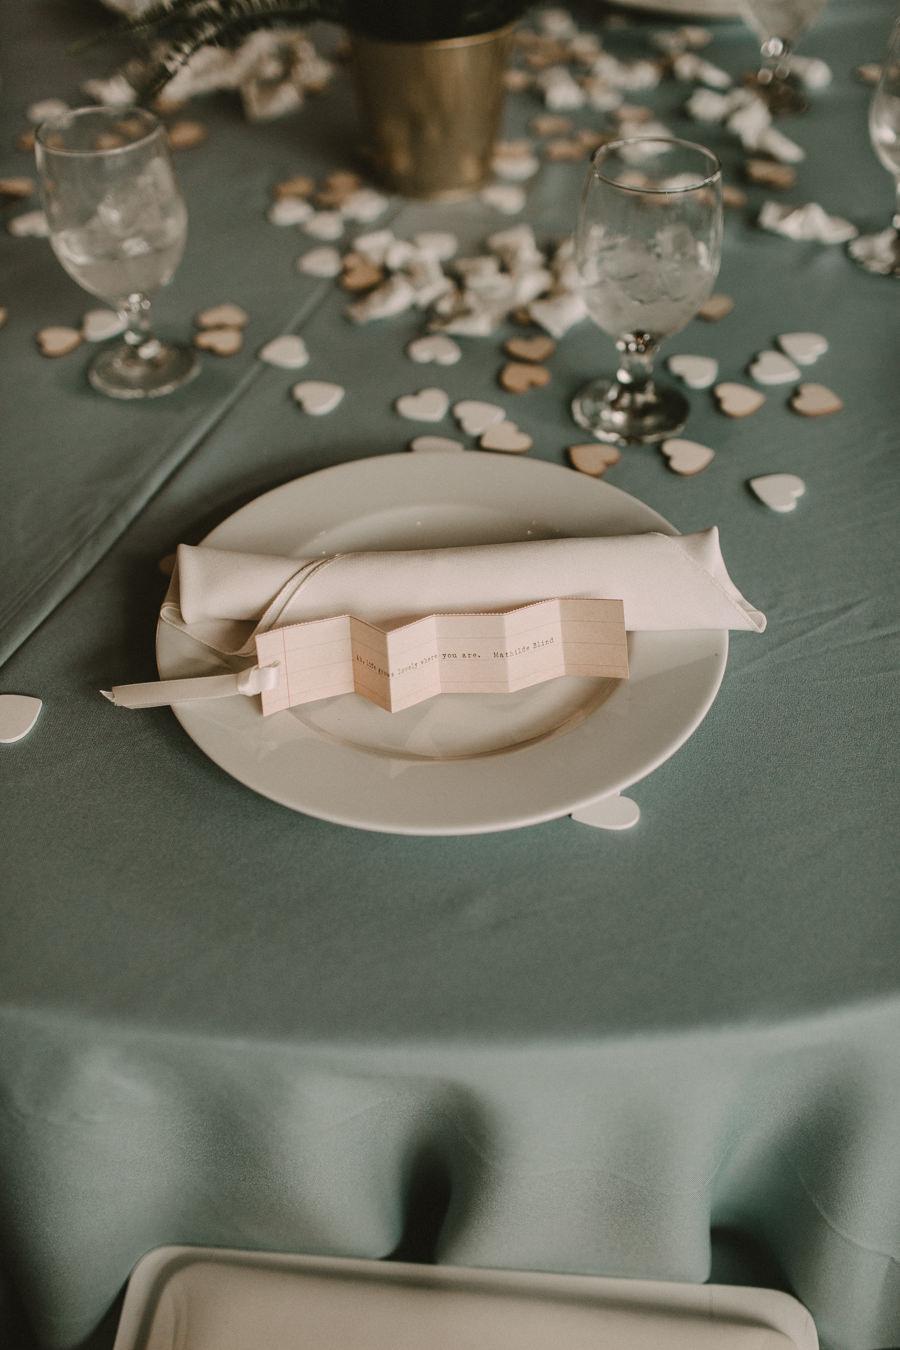 VeronicaandGarrett's Industrial Cavu Tampa Heights Wedding BHLDN gown Salt Block Hospitality Fancy Free Nursery Foundation Coffee-154.jpg